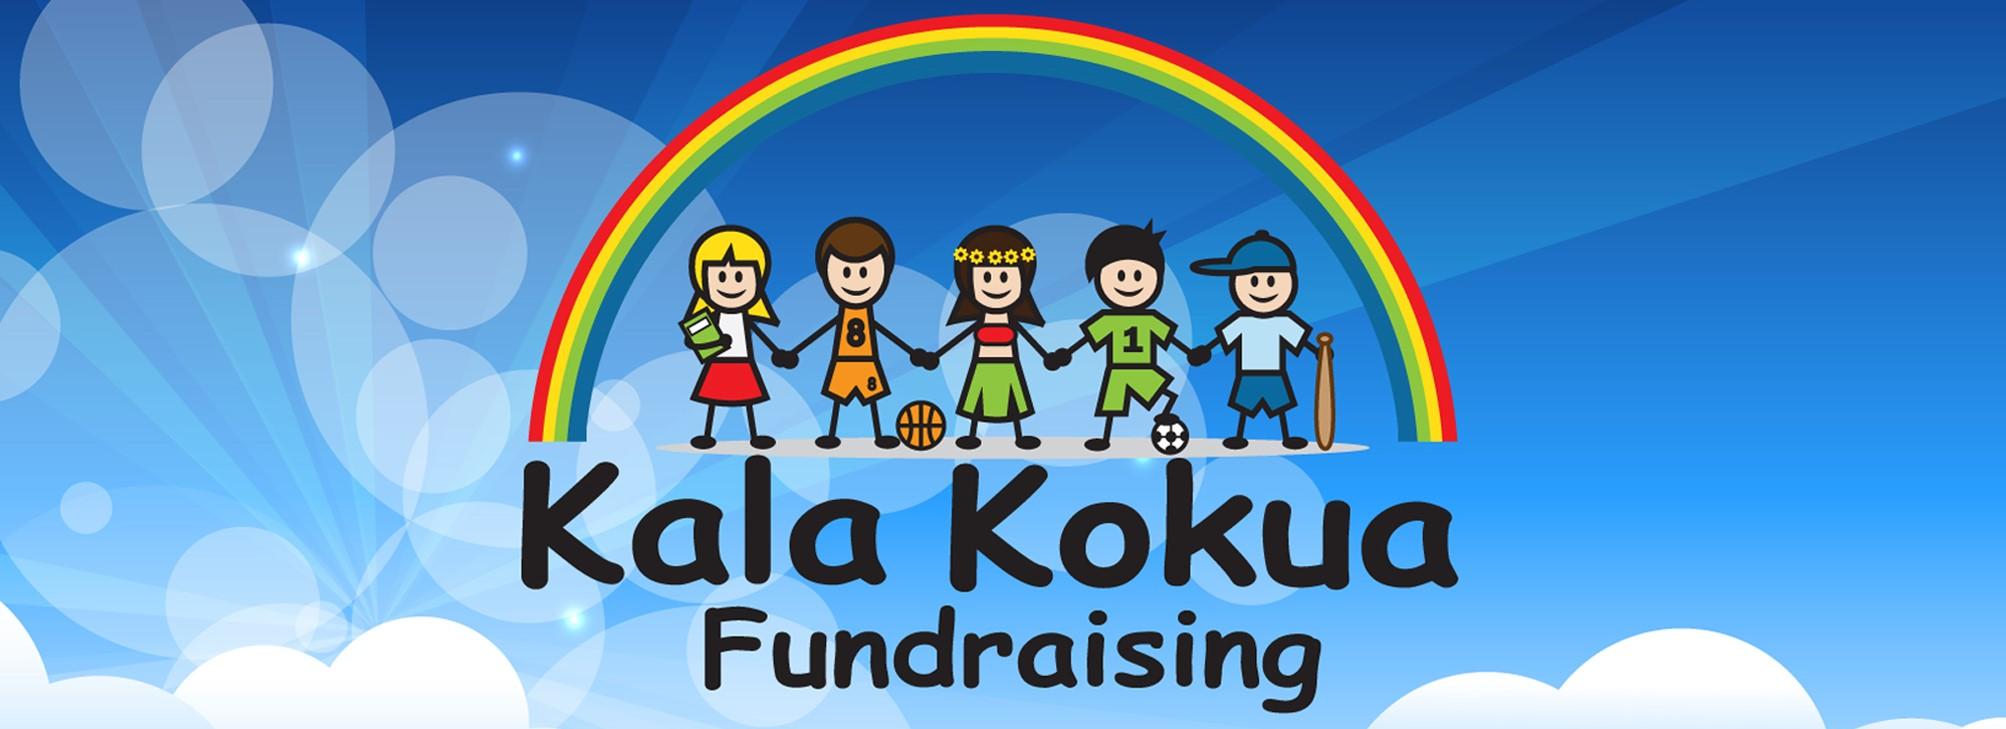 Kalakokua Fundraiser Pick-up POSTPONED. KEEP Your Tickets!